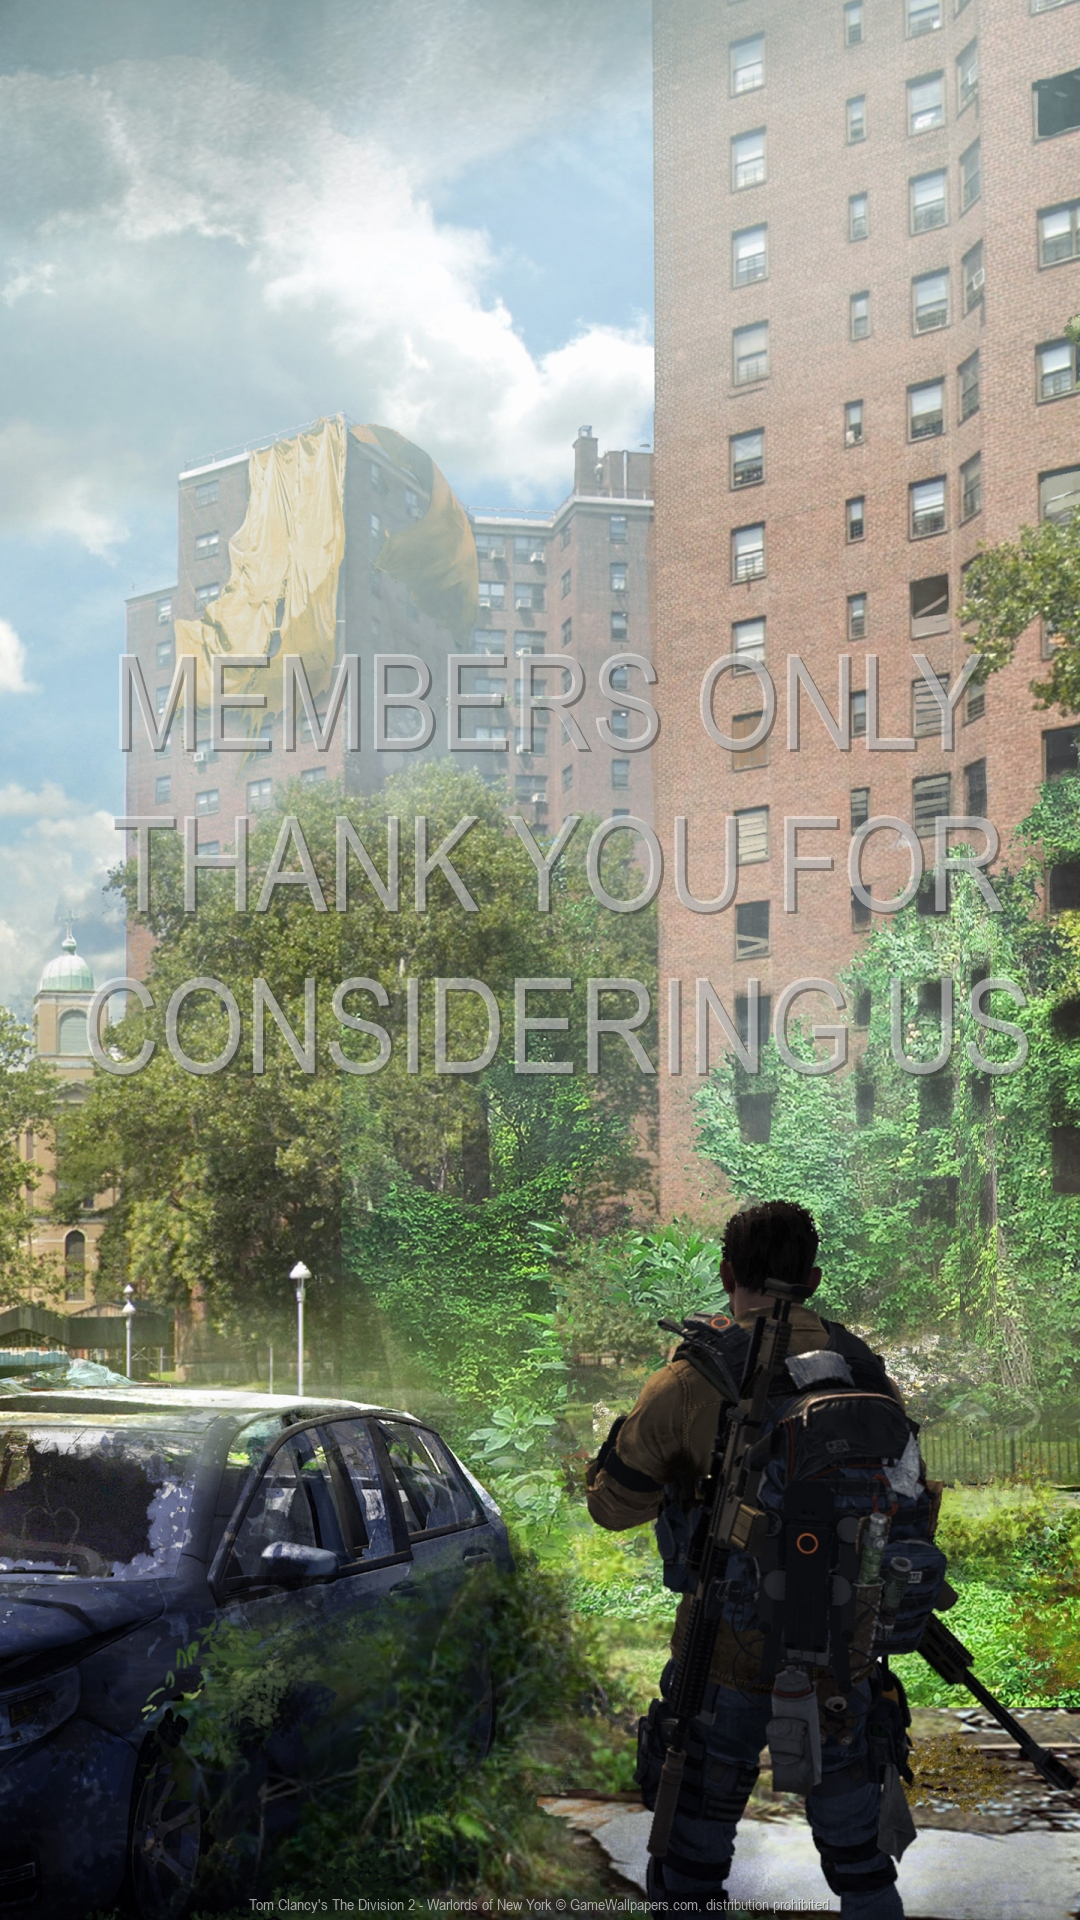 Tom Clancy's The Division 2 - Warlords of New York 1920x1080 Handy Hintergrundbild 03